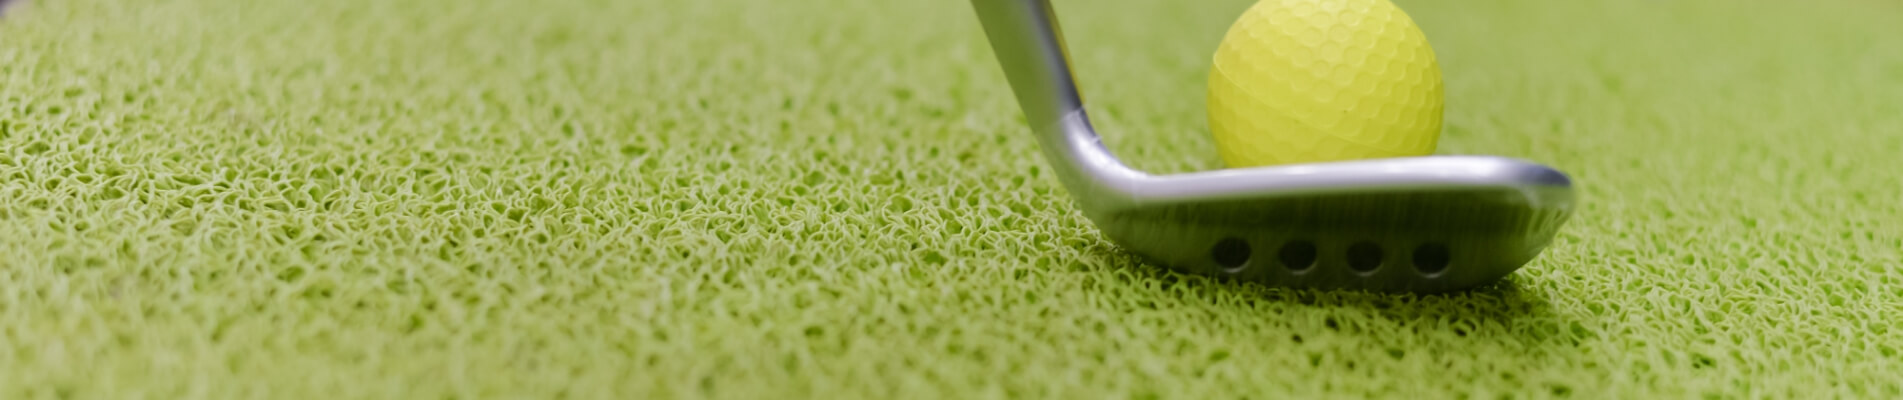 Césped artificial para campos de golf